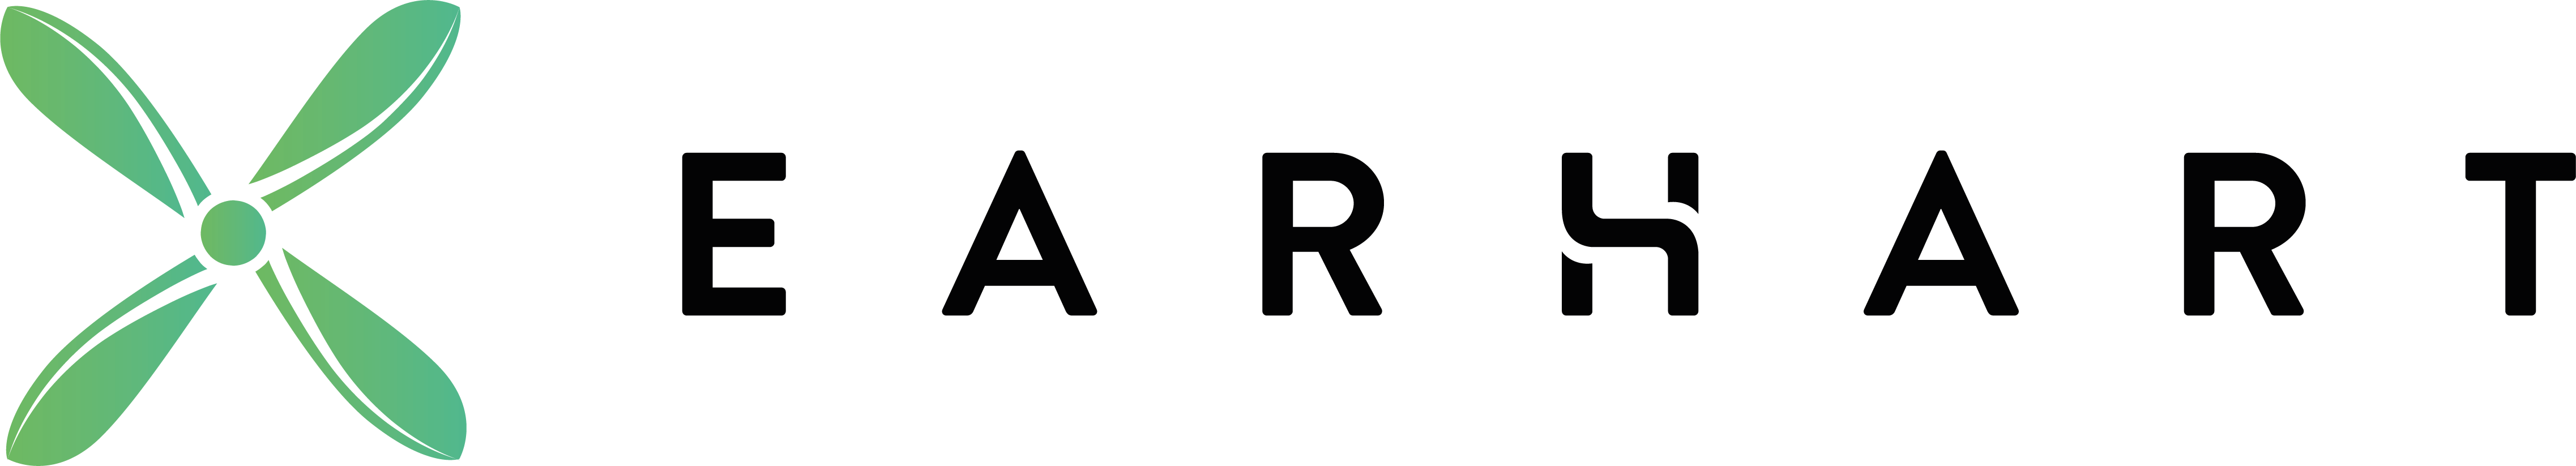 earhart-logo